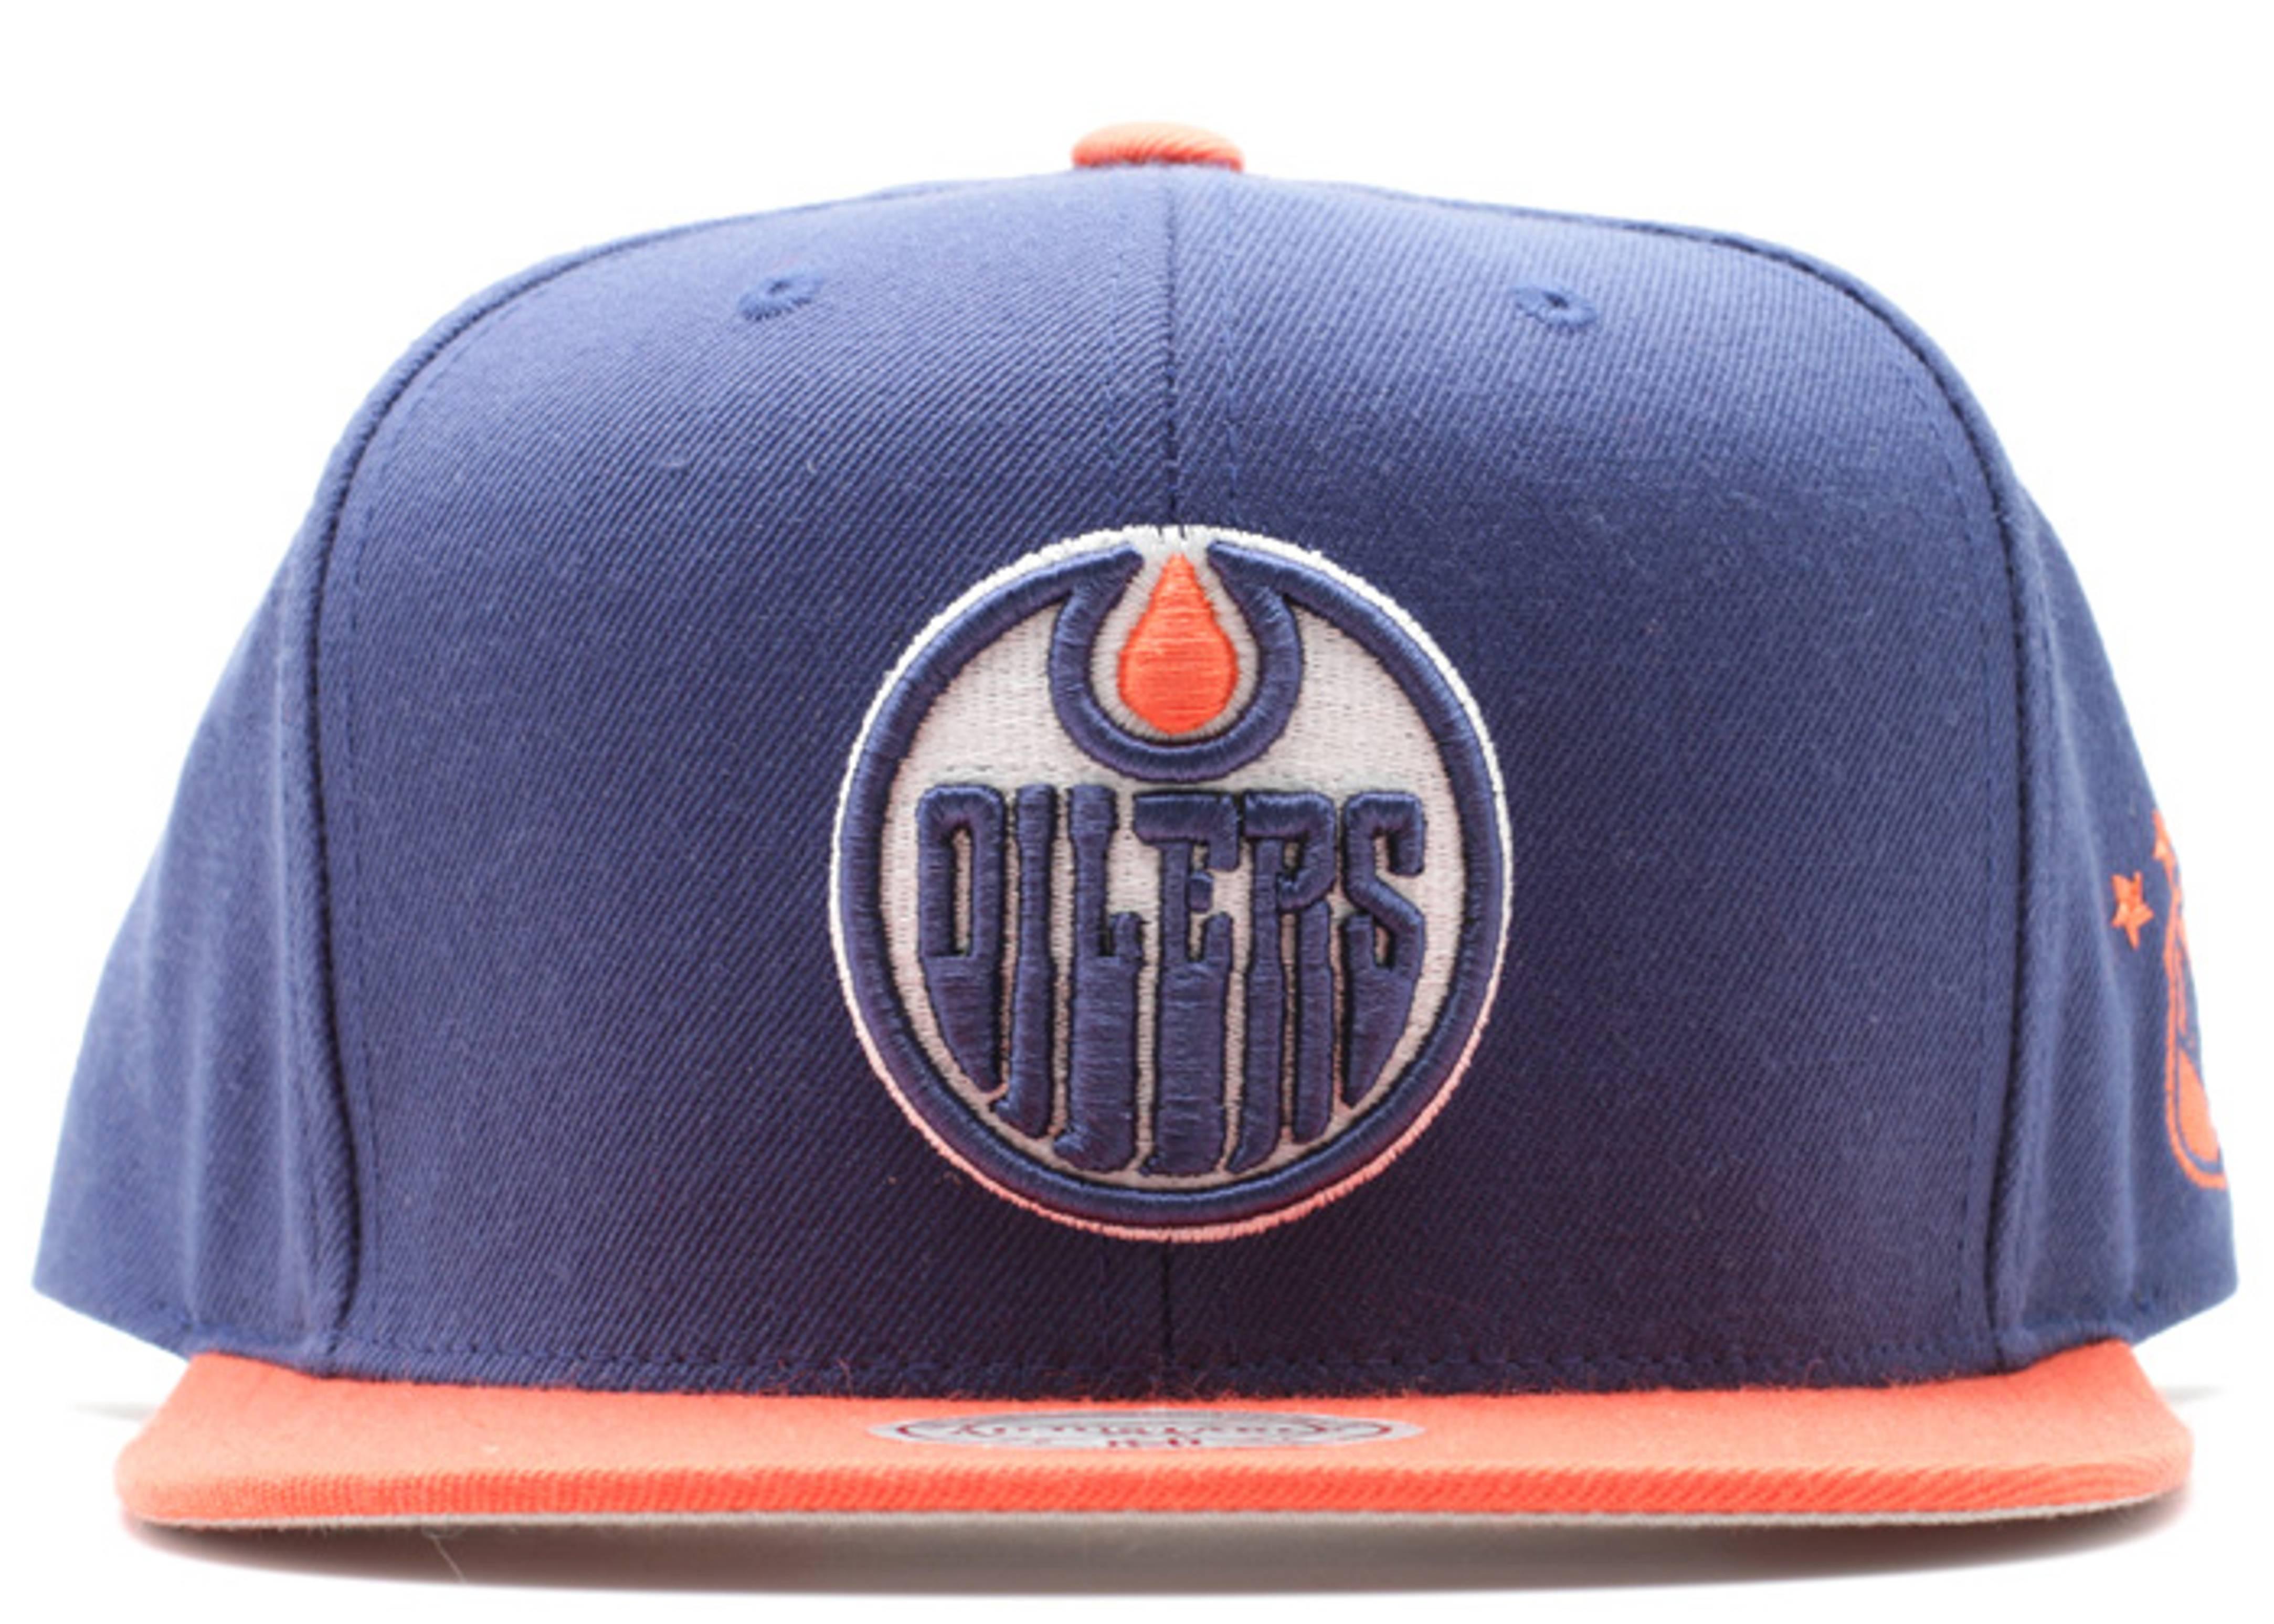 online retailer a9ced e4a4b Edmonton Oilers Snap-back - Mitchell & Ness - nc98mtc7oiler ...